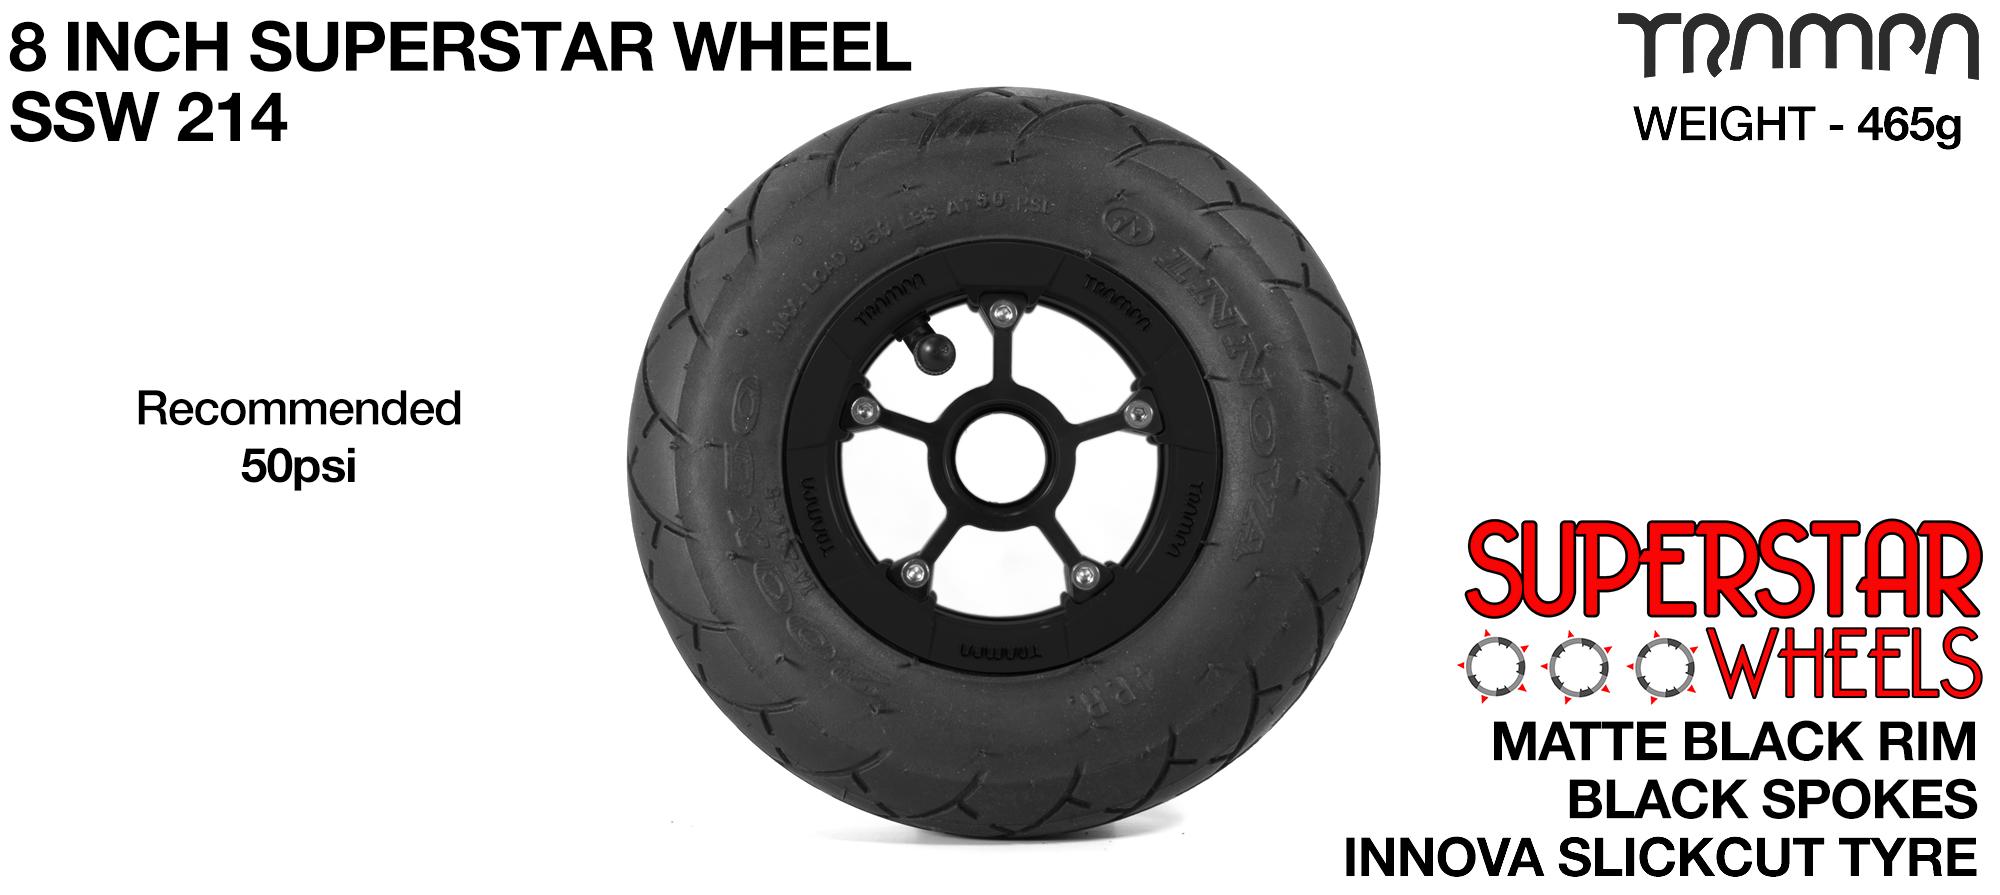 Superstar 8 inch wheels - Matt Black Superstar Rim with Black Anodised spokes & Black SLICK cut 8 inch Tyre